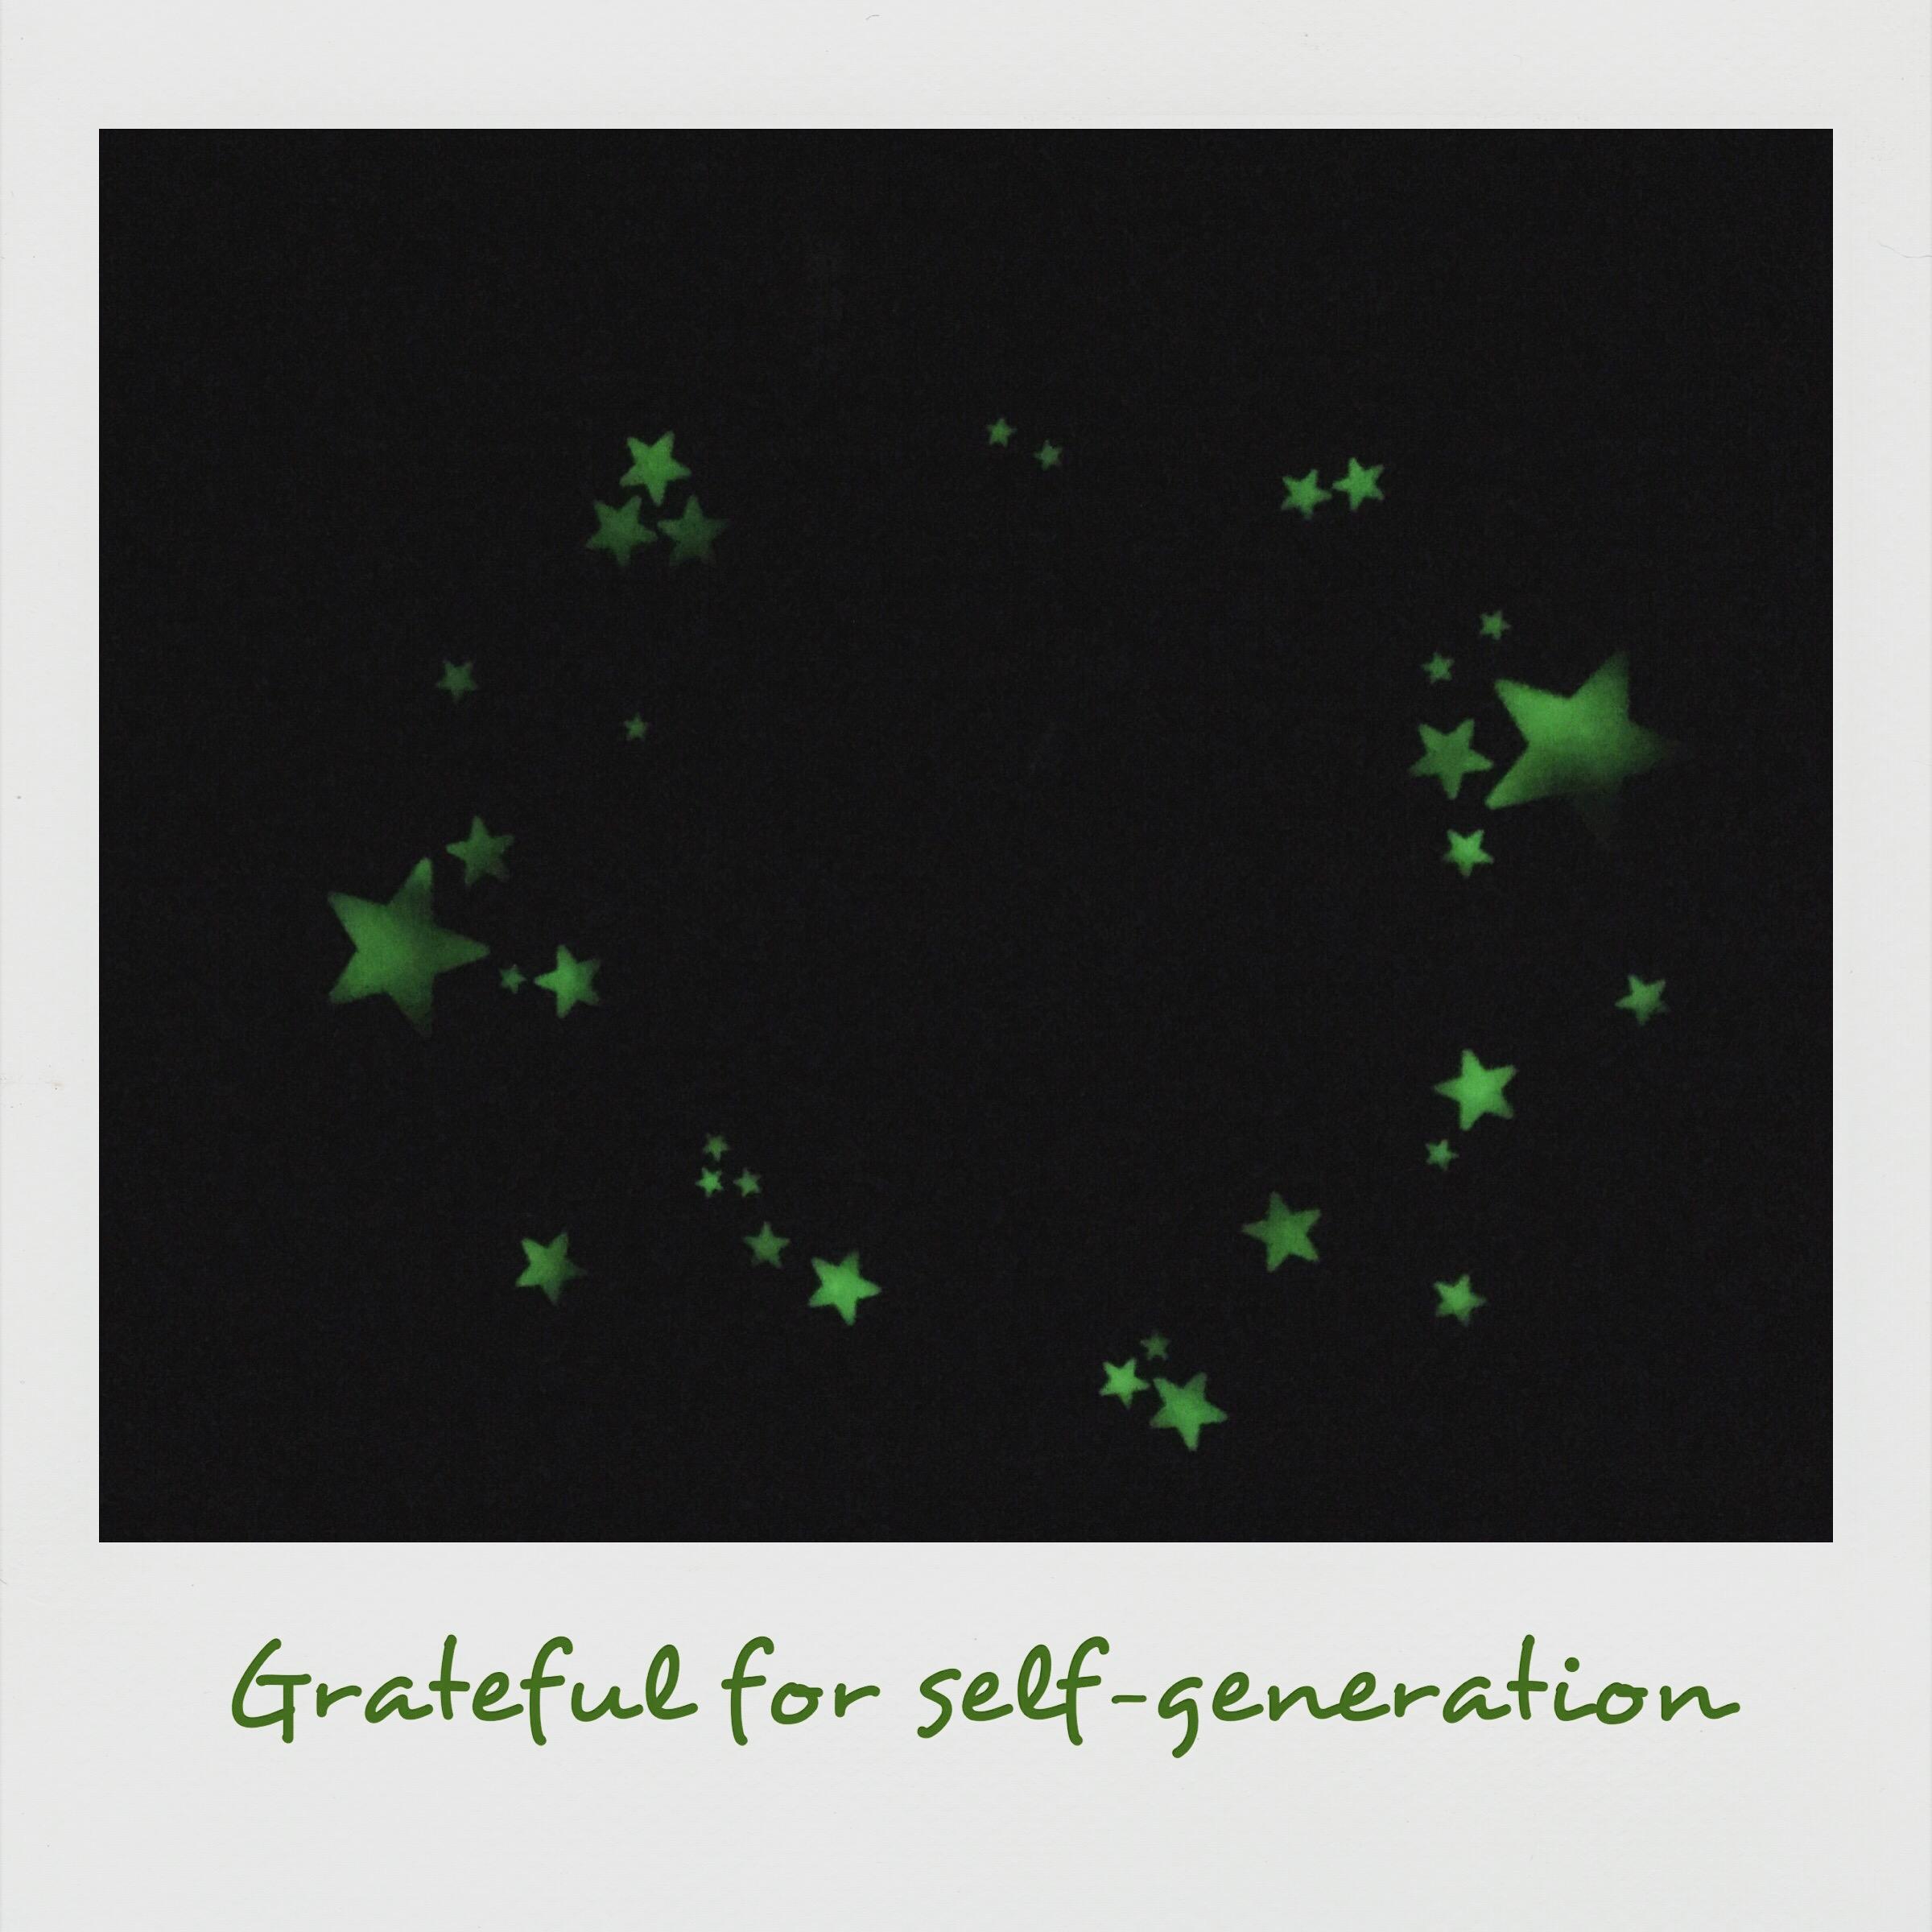 Grateful of self-generation